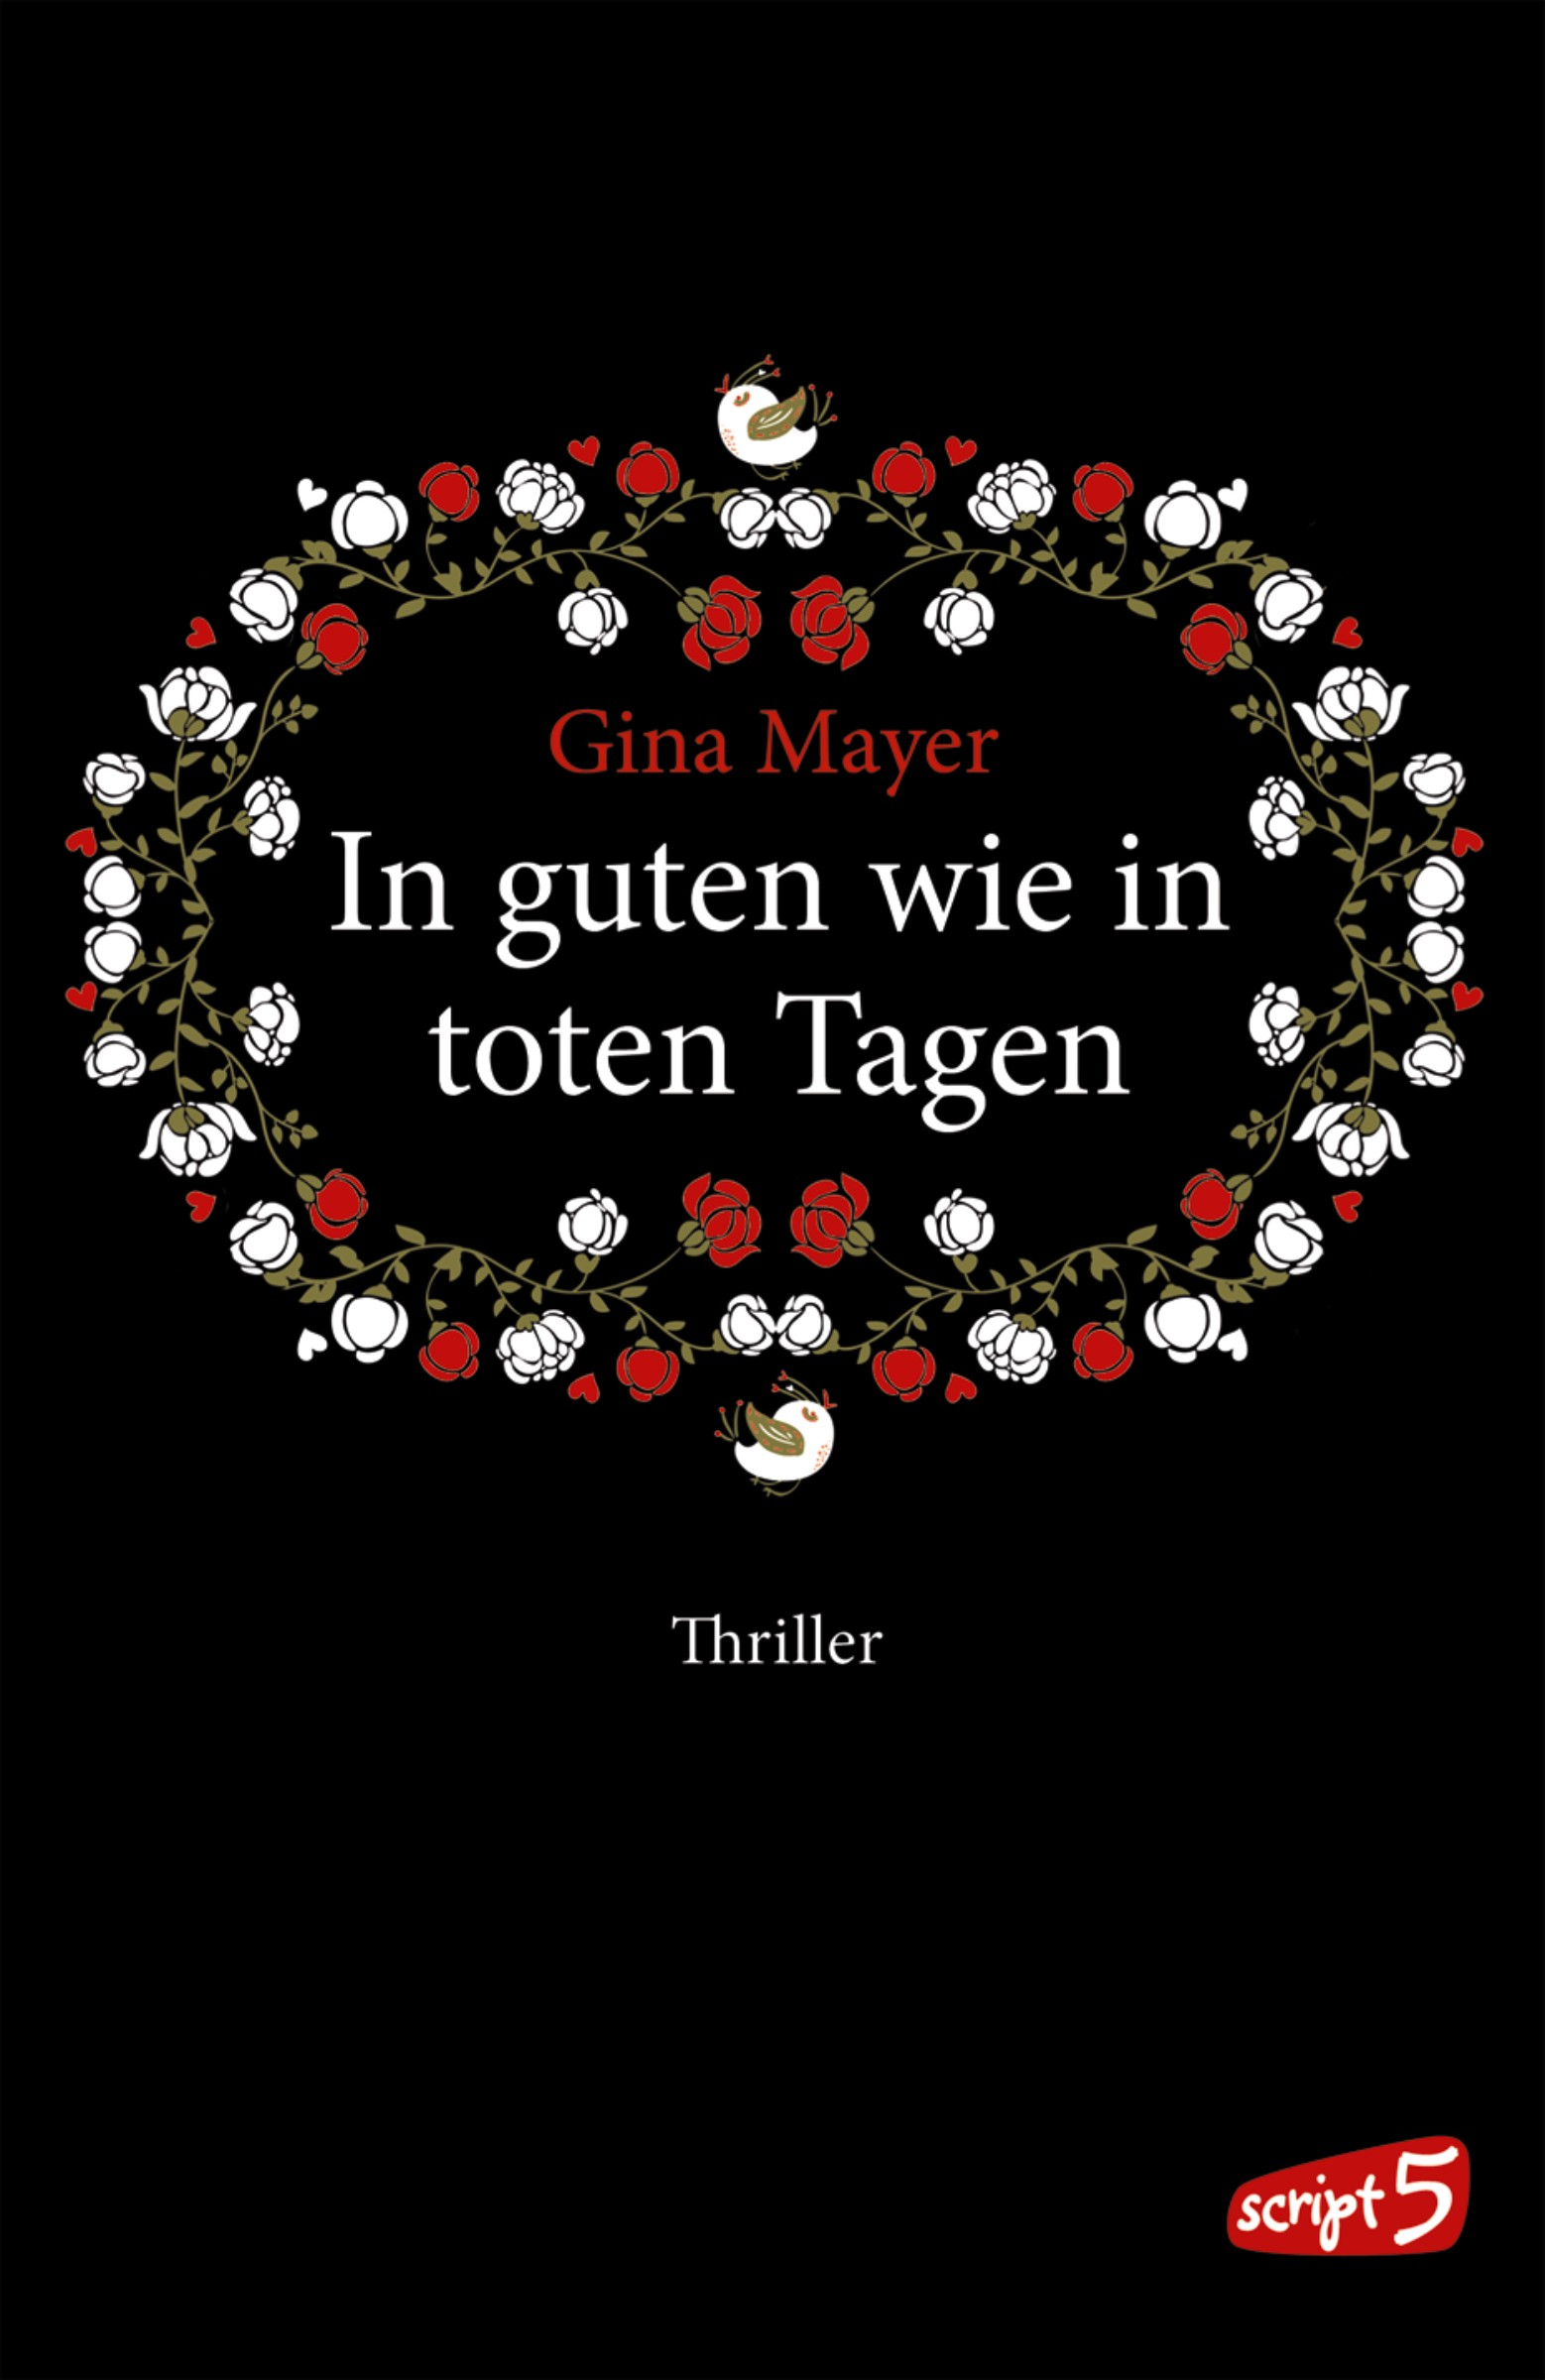 цена Gina Mayer In guten wie in toten Tagen